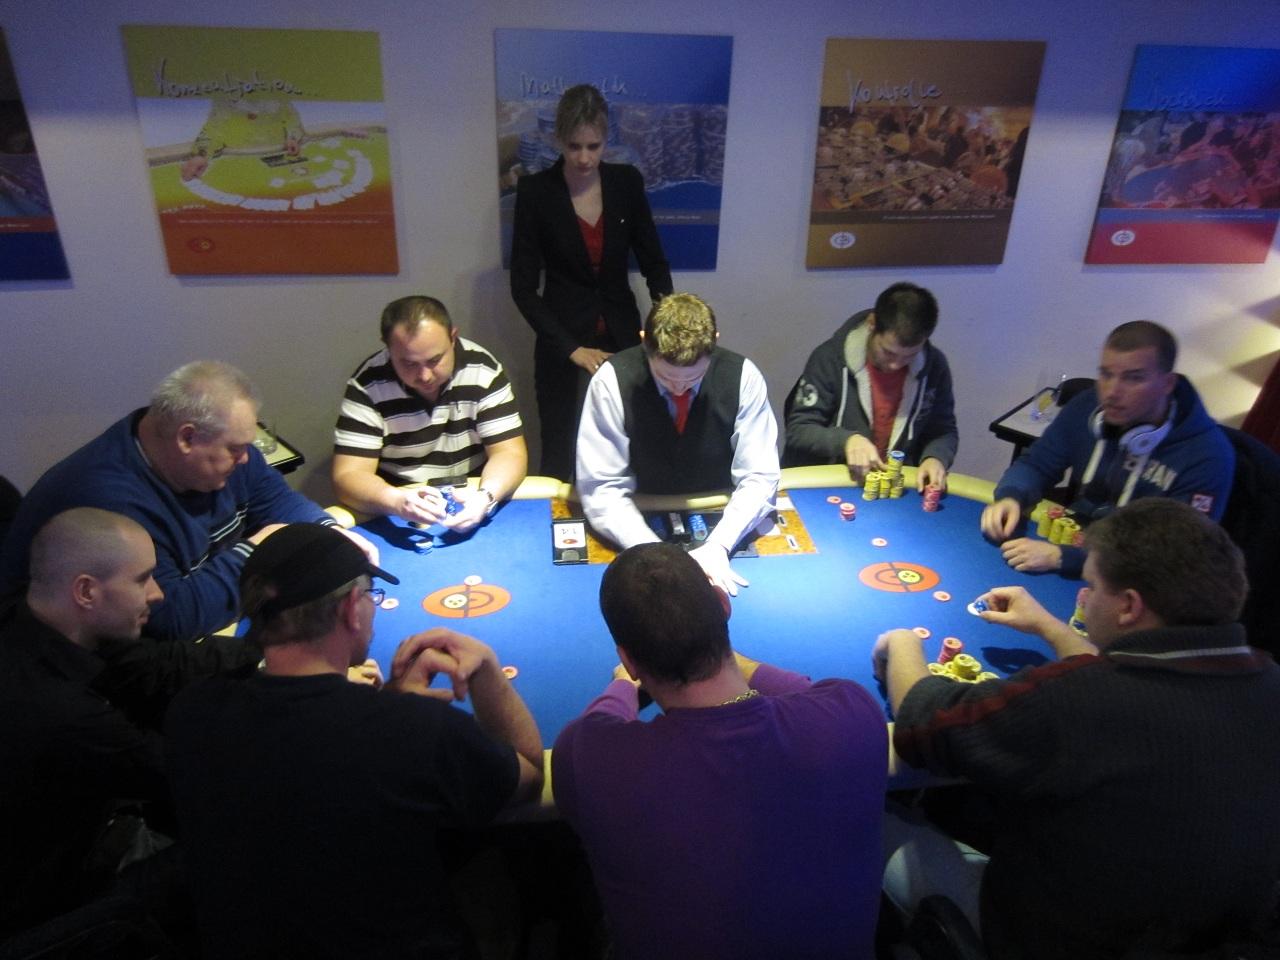 Holdem tournament